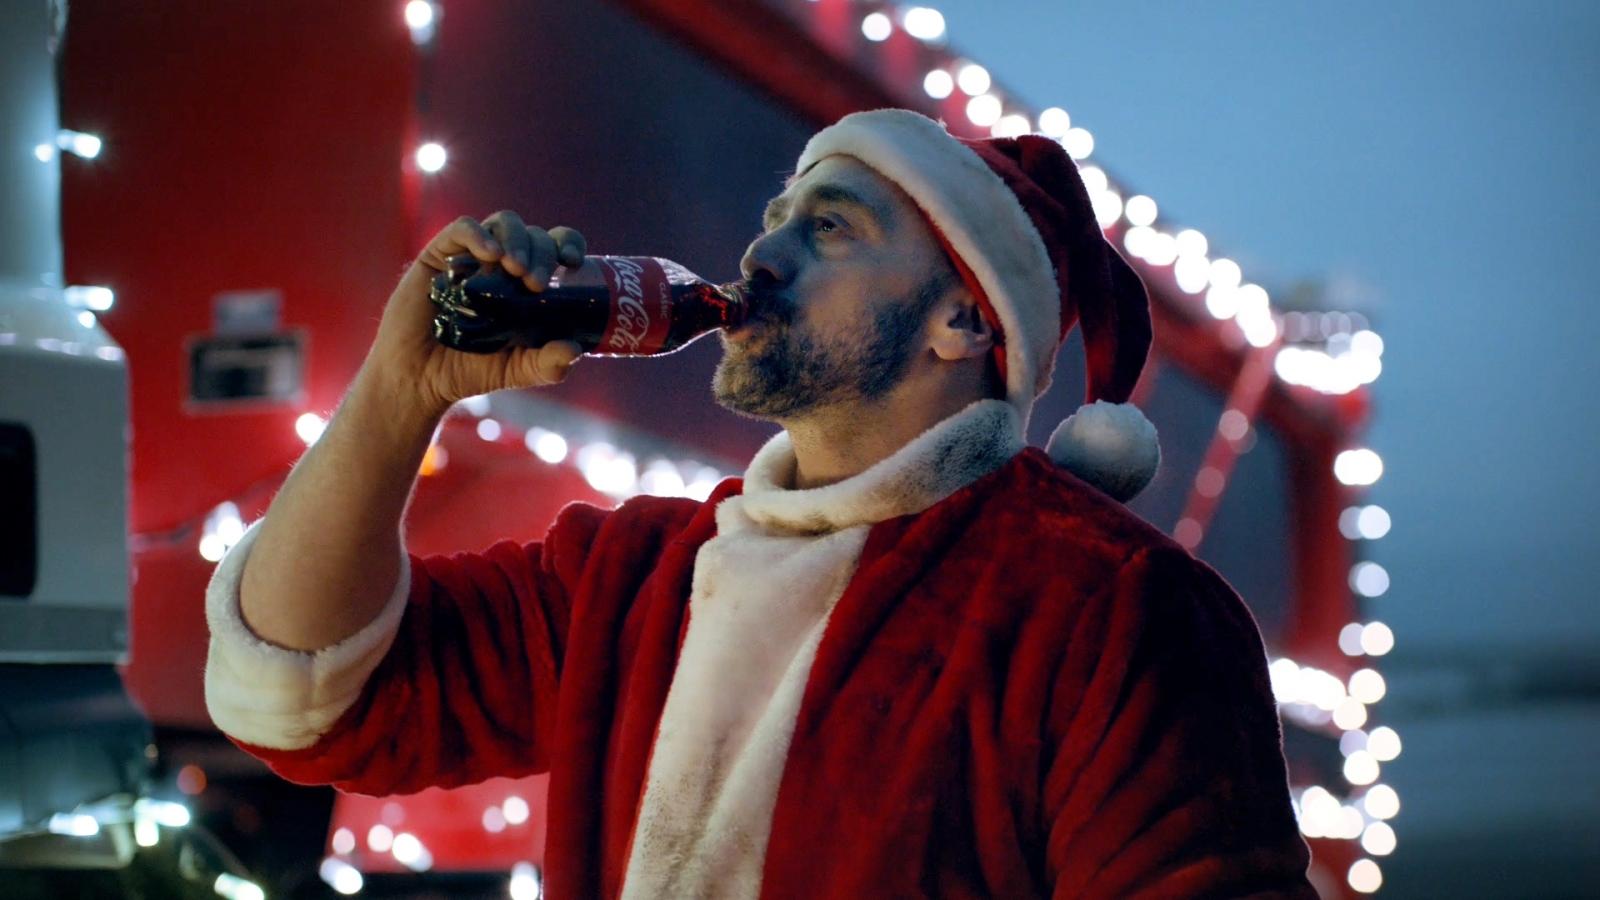 Greenpeace anti-Coke ad